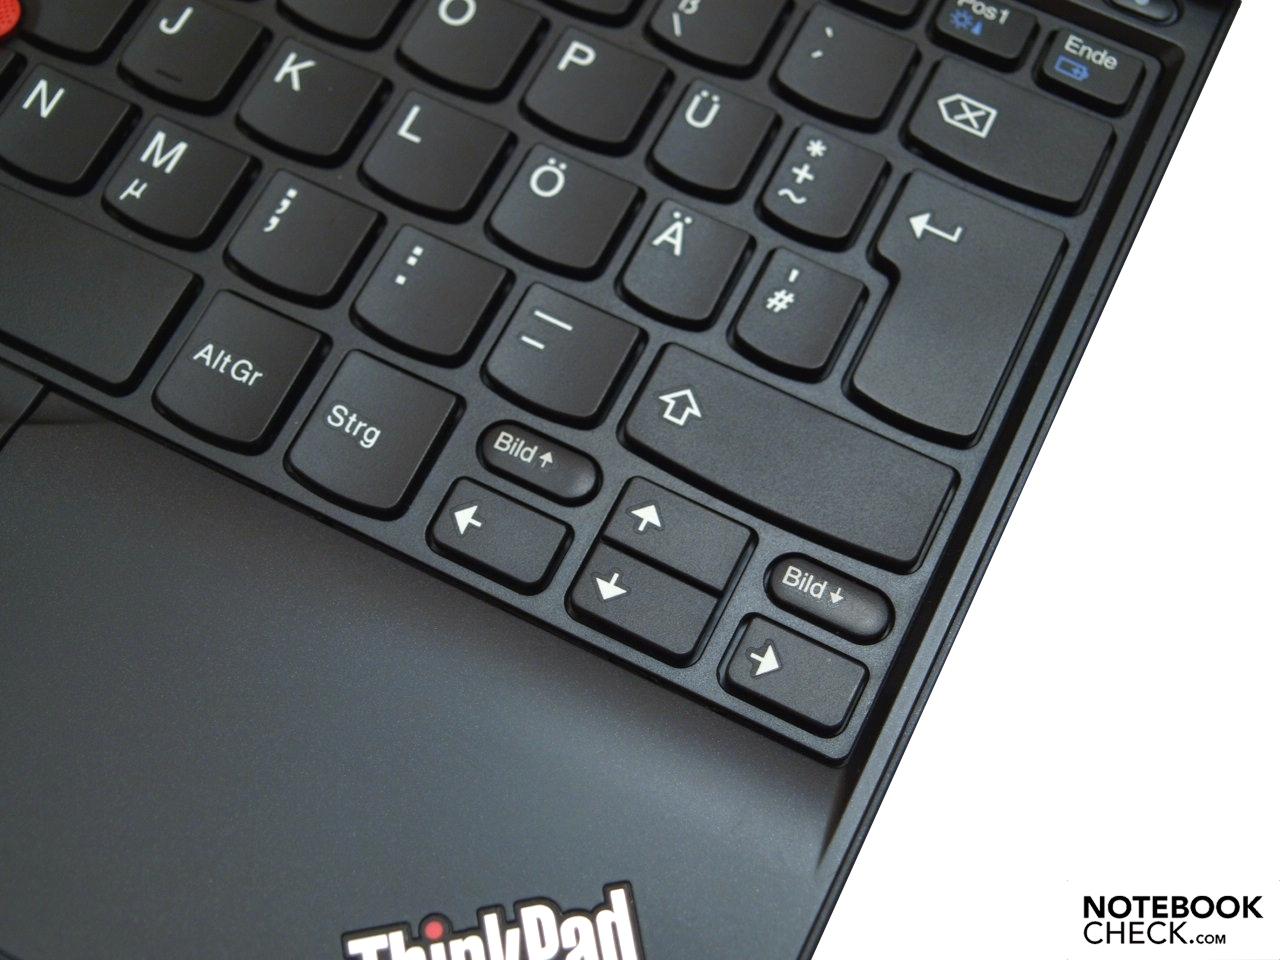 Review Lenovo Thinkpad X100e Subnotebook Notebookcheck